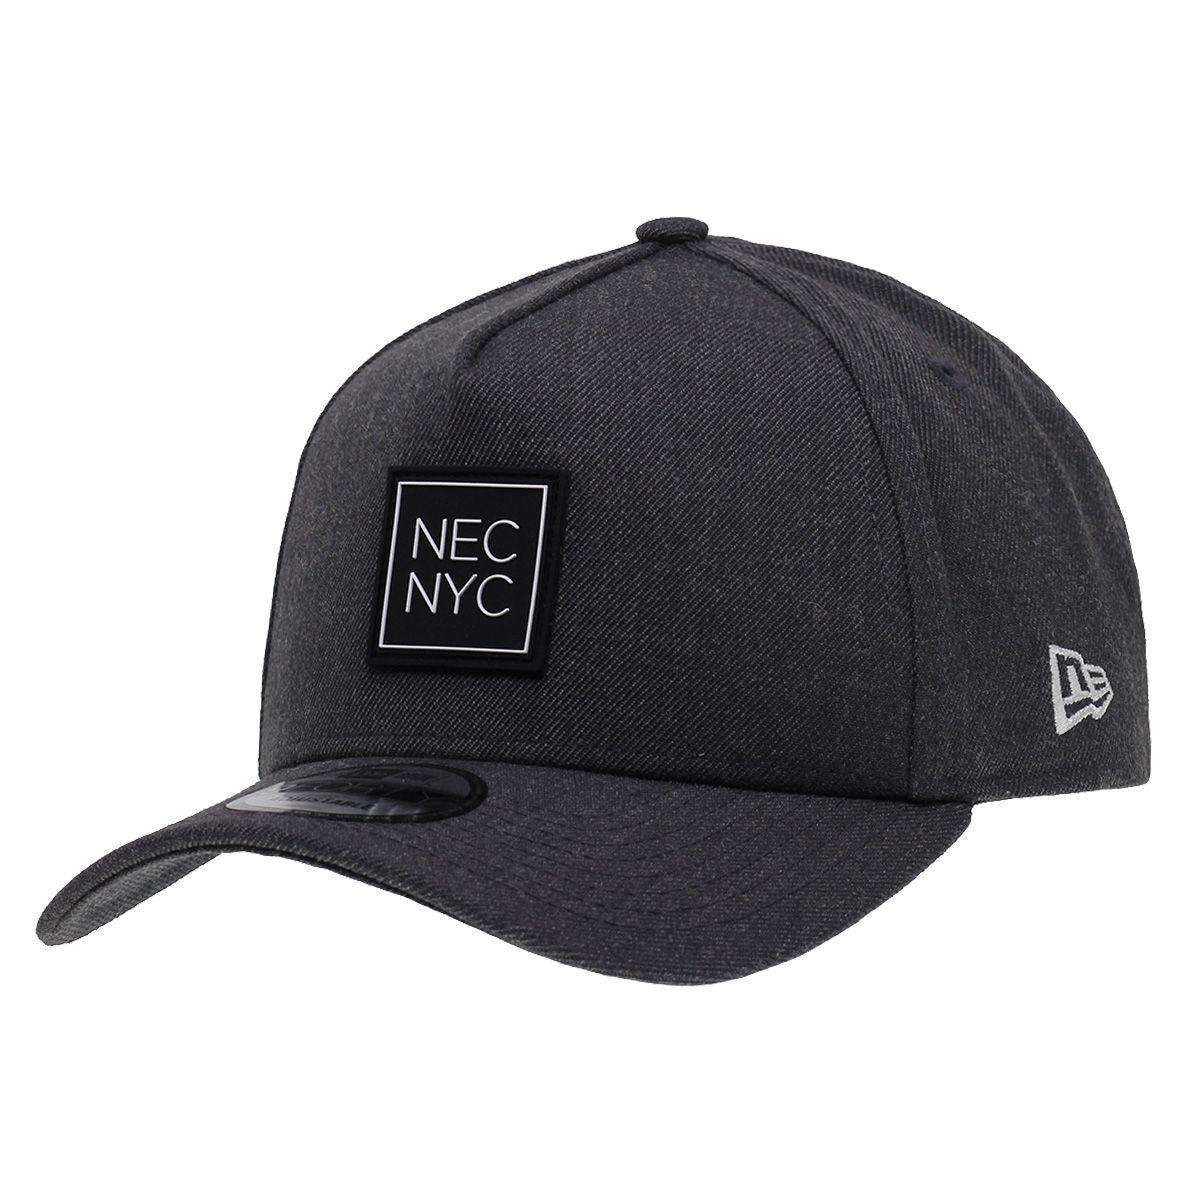 Boné New Era Aba Curva 940 SN Brand AF NEC NYC Rubber Cinza